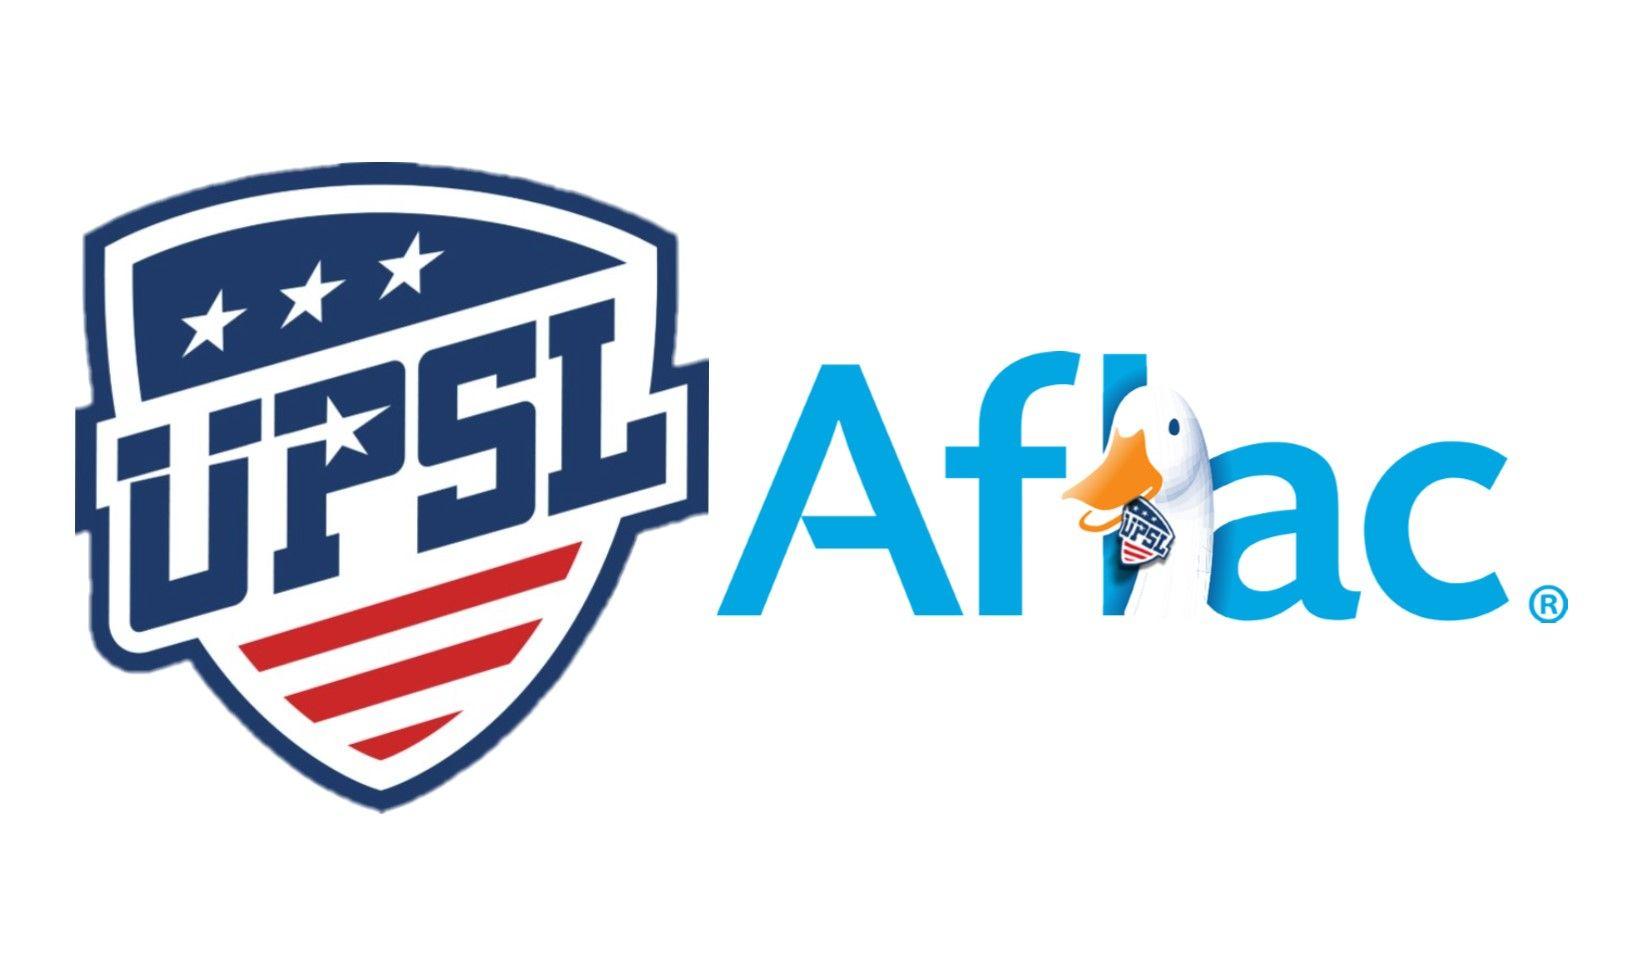 UPSL_AFLAC